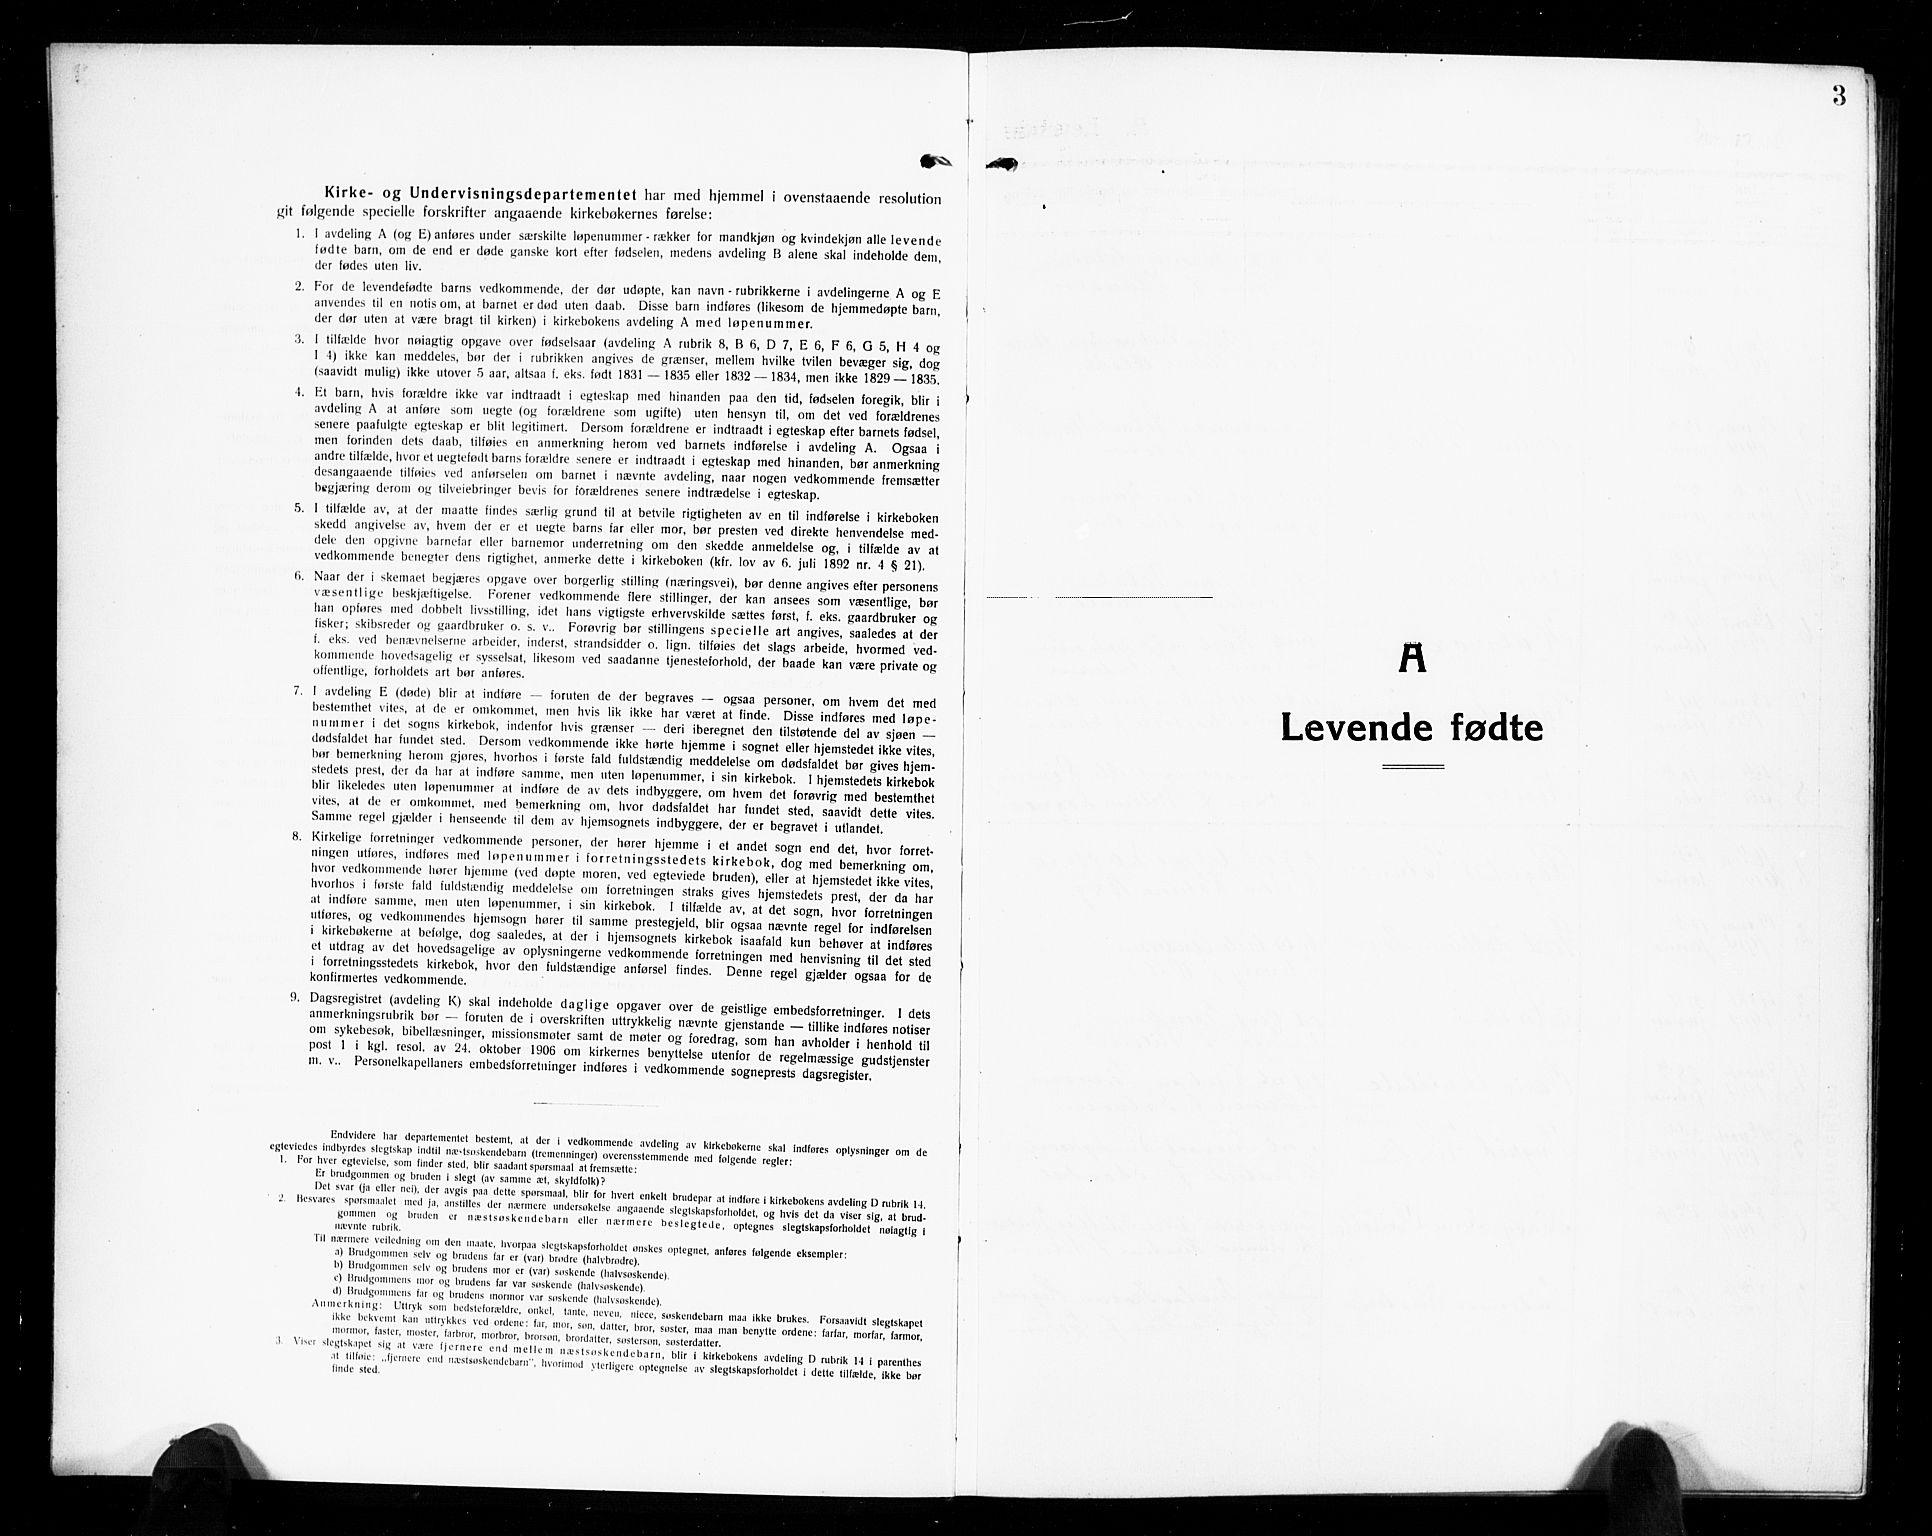 SAKO, Solum kirkebøker, G/Gb/L0006: Klokkerbok nr. II 6, 1915-1927, s. 3